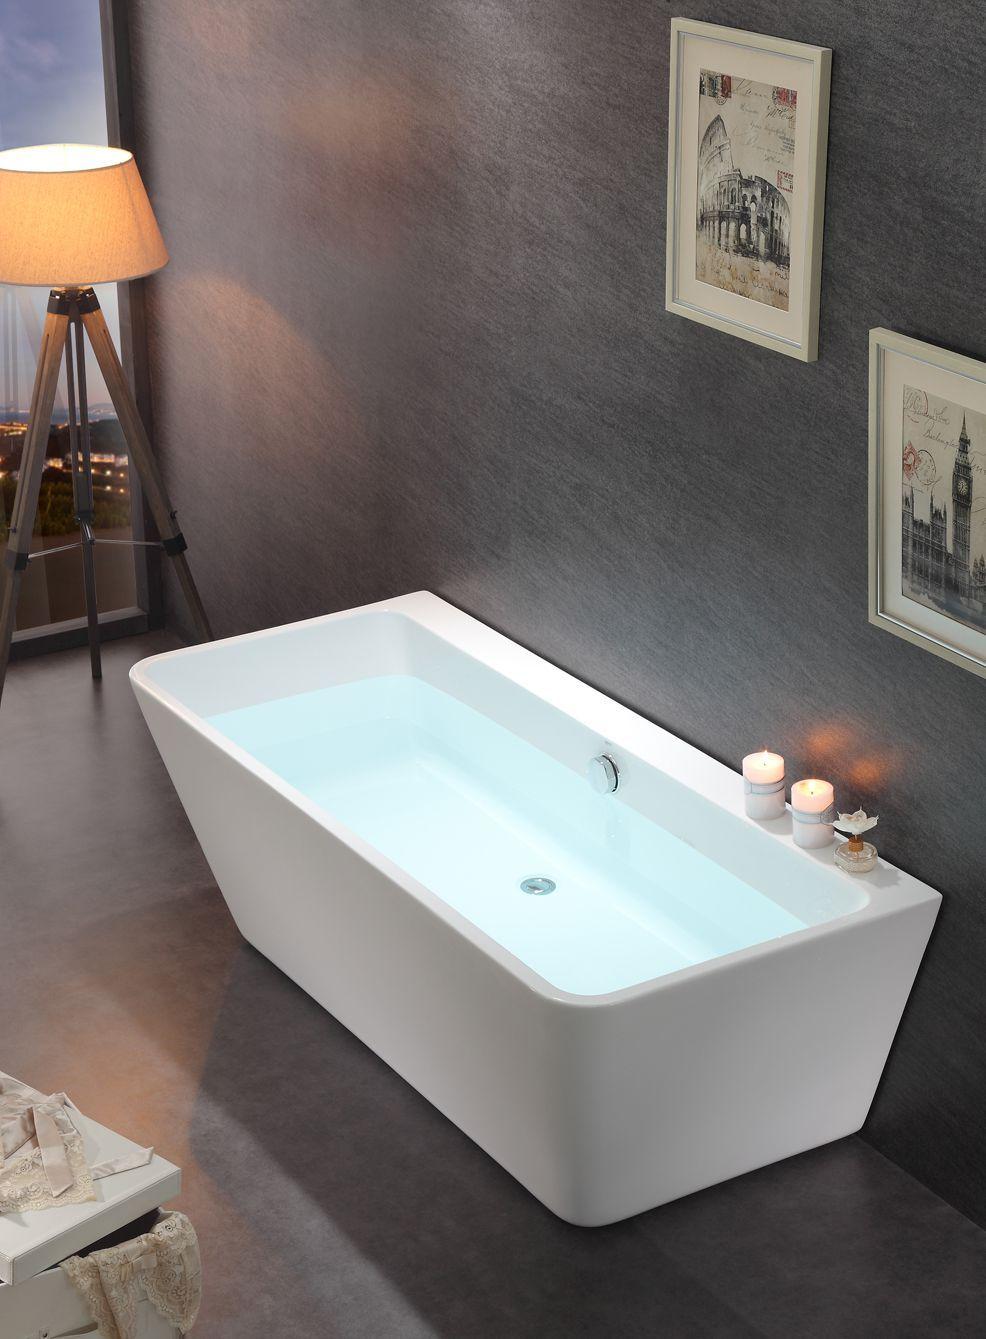 Alpha Camden BTW Freestanding Bath This Stunning Back To Wall - Freestanding tub against wall